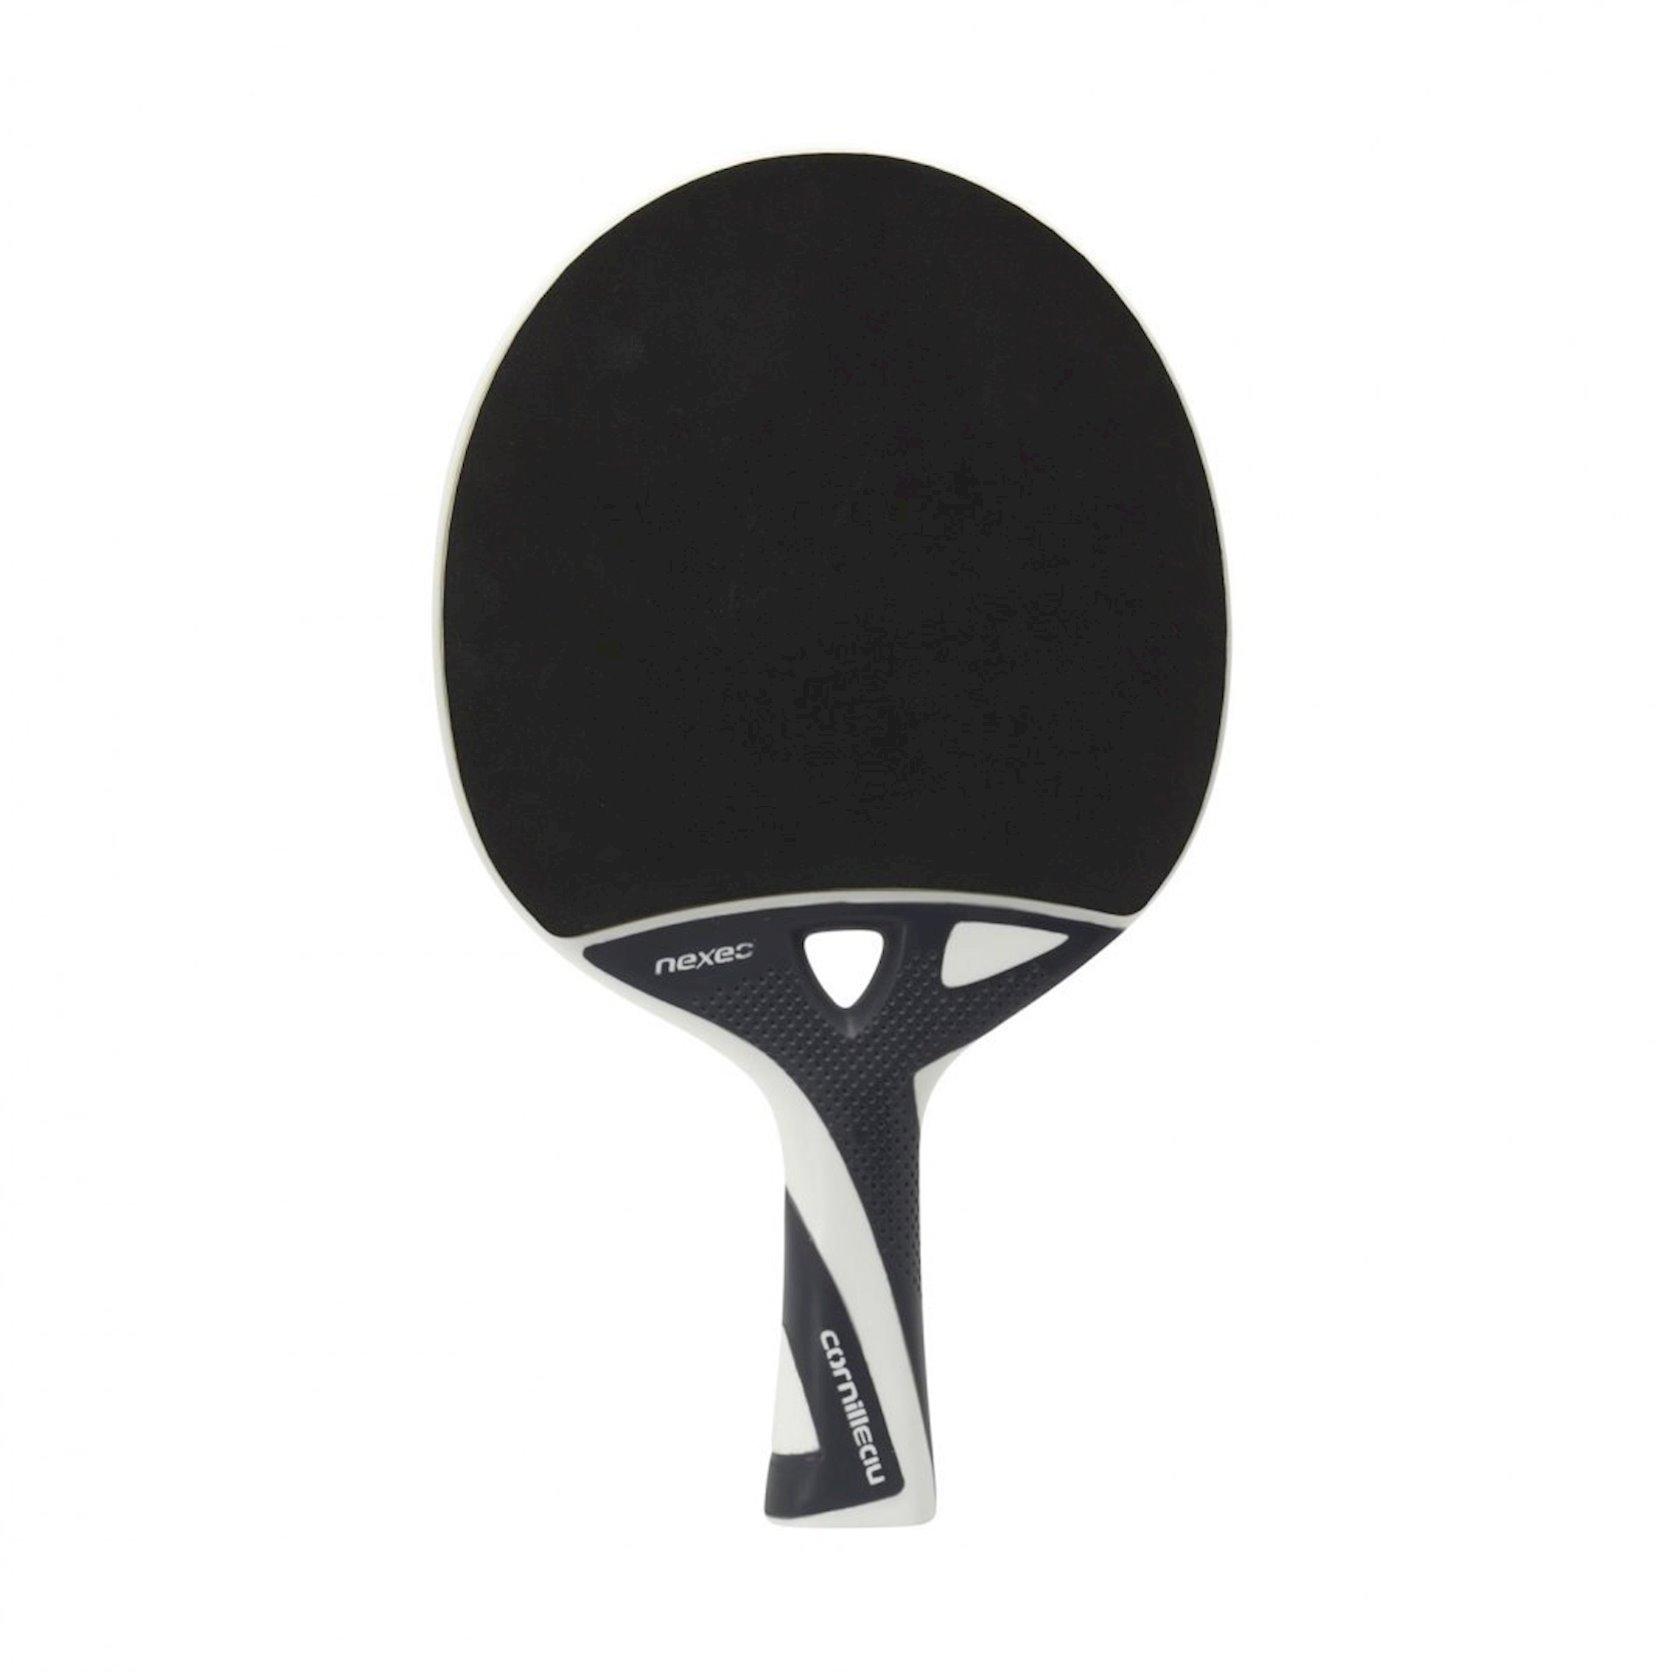 Stolüstü tennis raketkası Cornilleau Nexeo X70 Carbon Table Tennis Bat